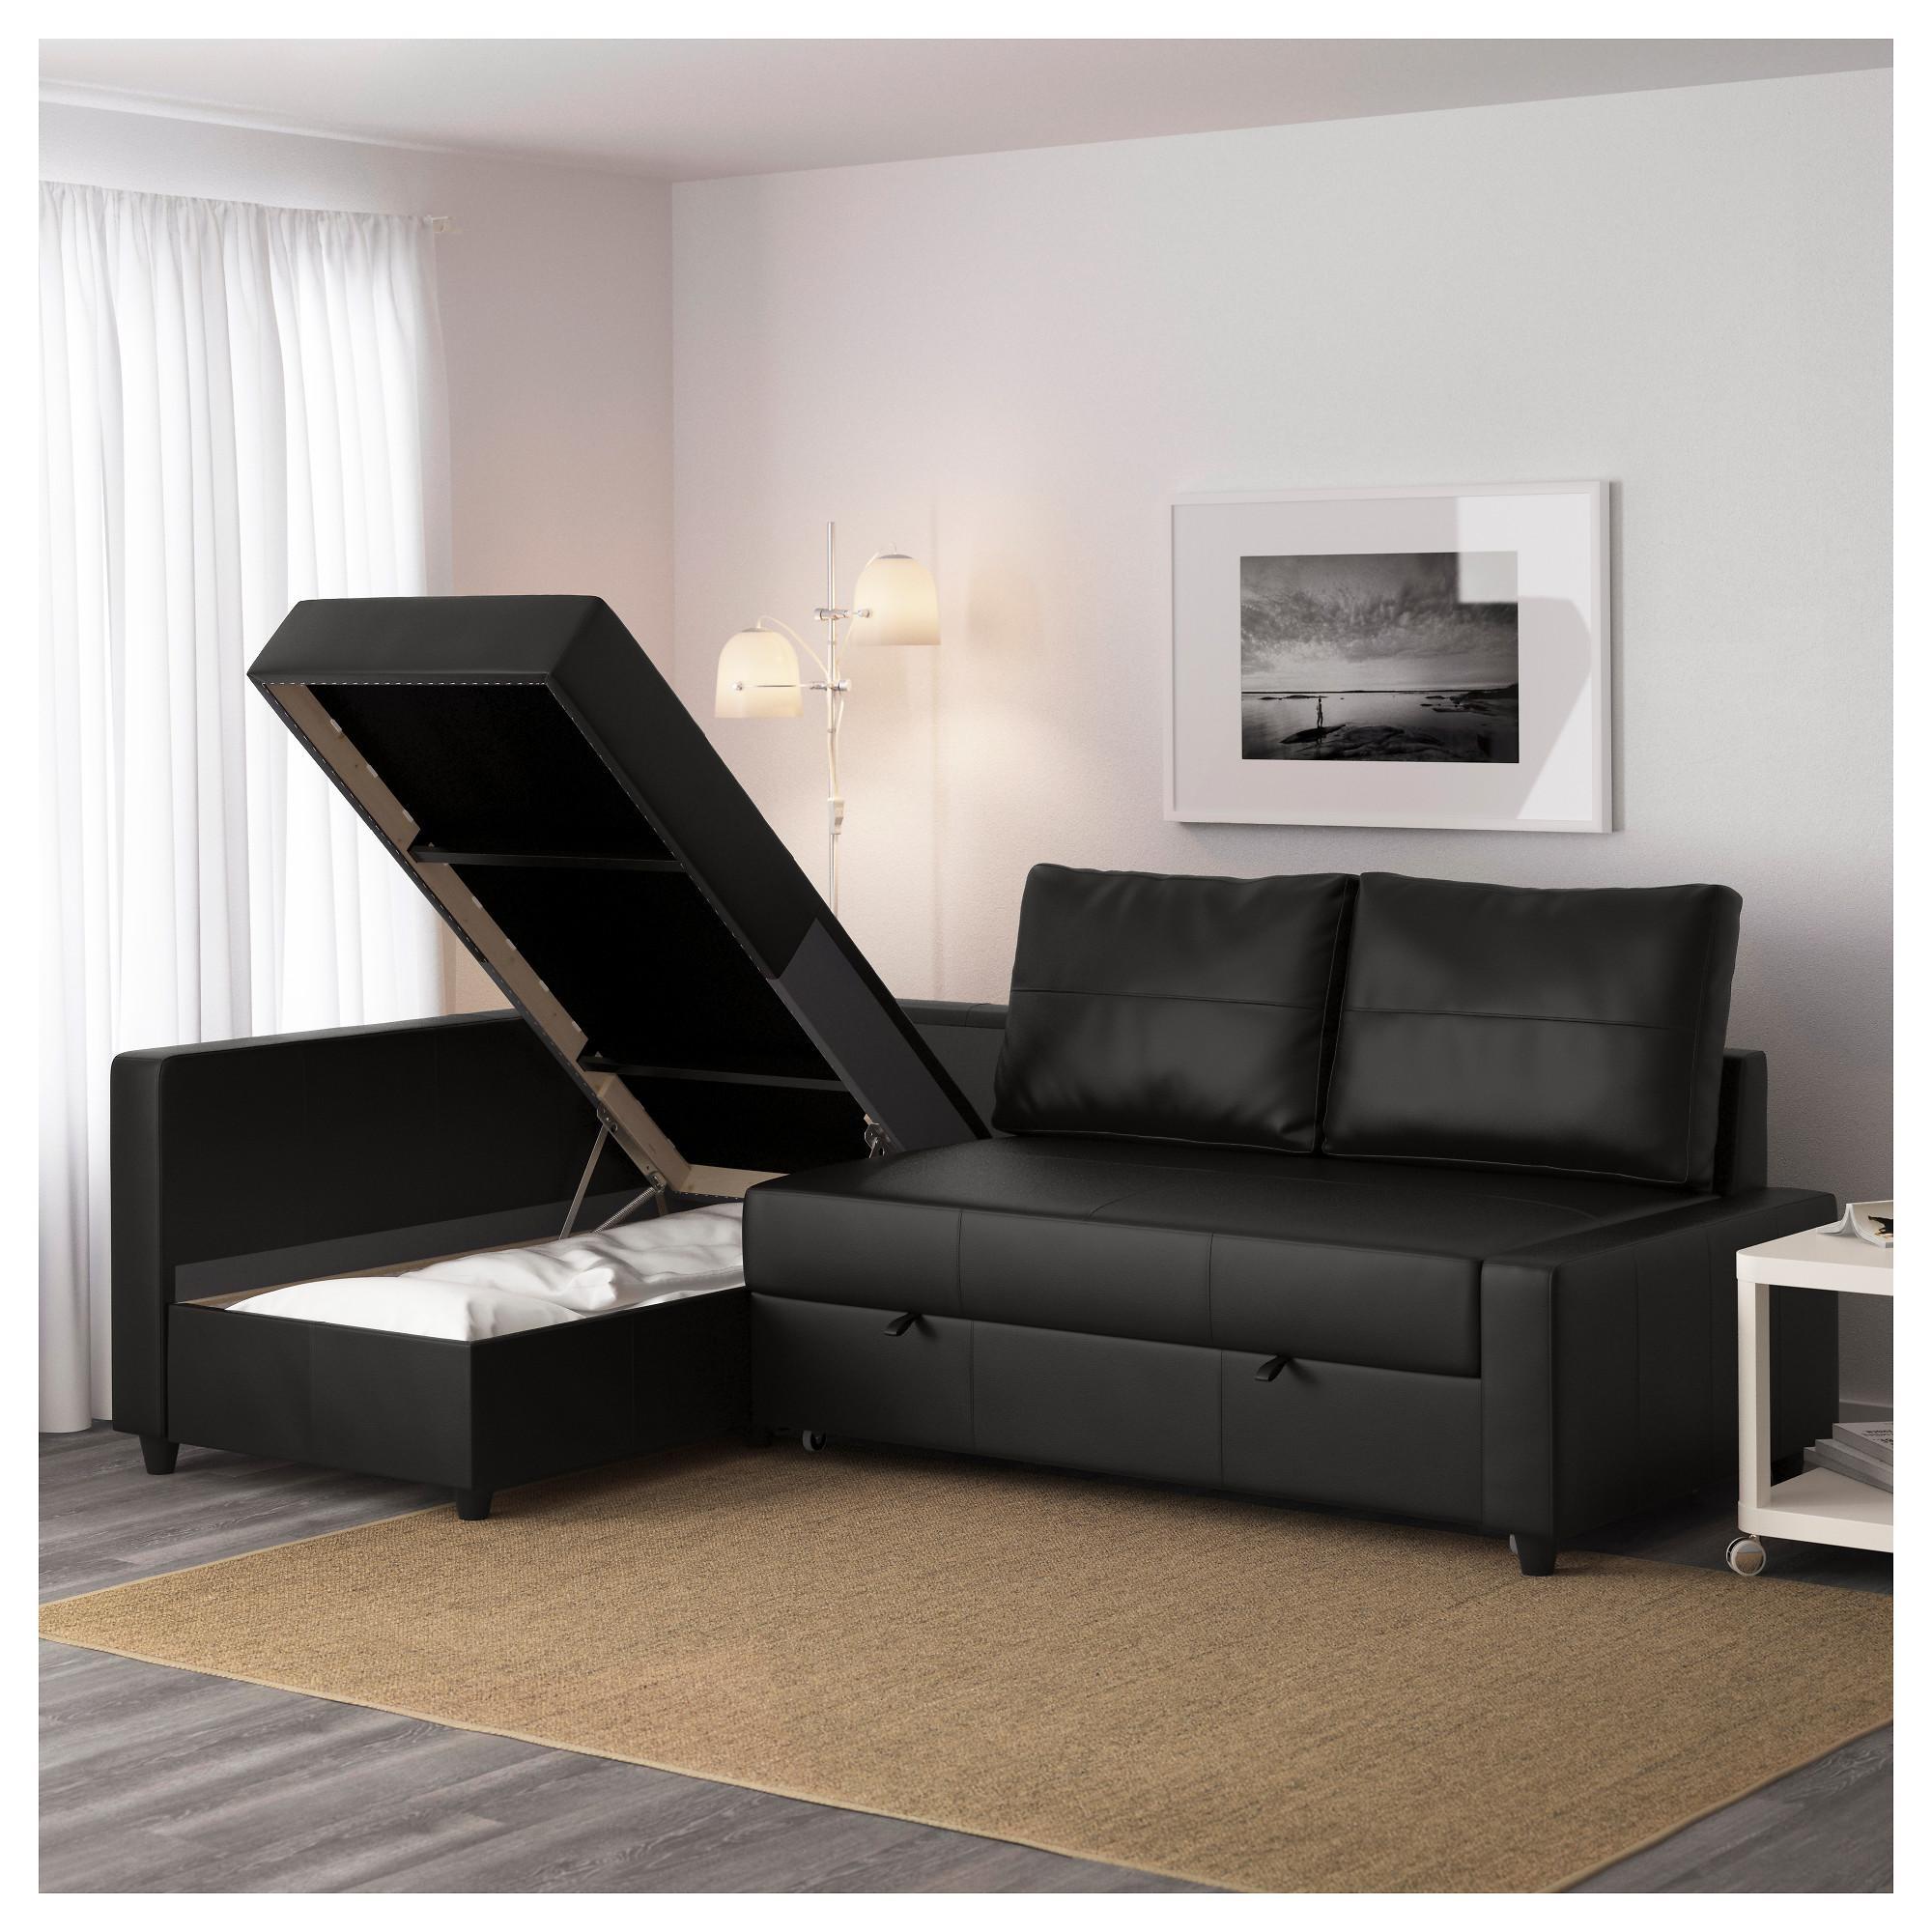 Friheten Corner Sofa Bed With Storage – Skiftebo Dark Gray – Ikea With Ikea Corner Sofa Bed With Storage (Image 2 of 20)